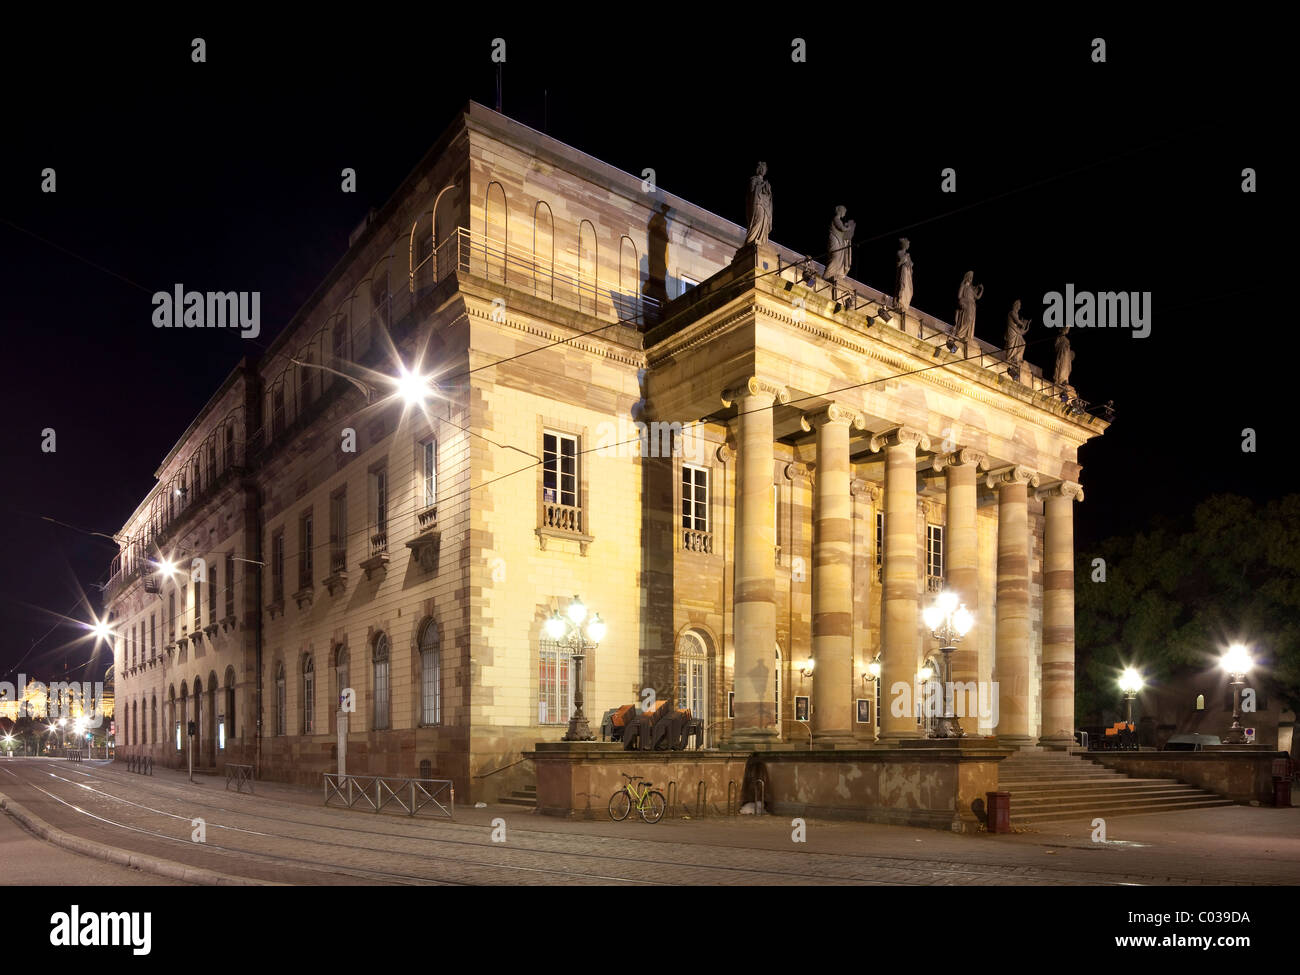 Alsatian Theater, Théâtre Alsacien, Strasbourg, Alsace, France, Europe - Stock Image